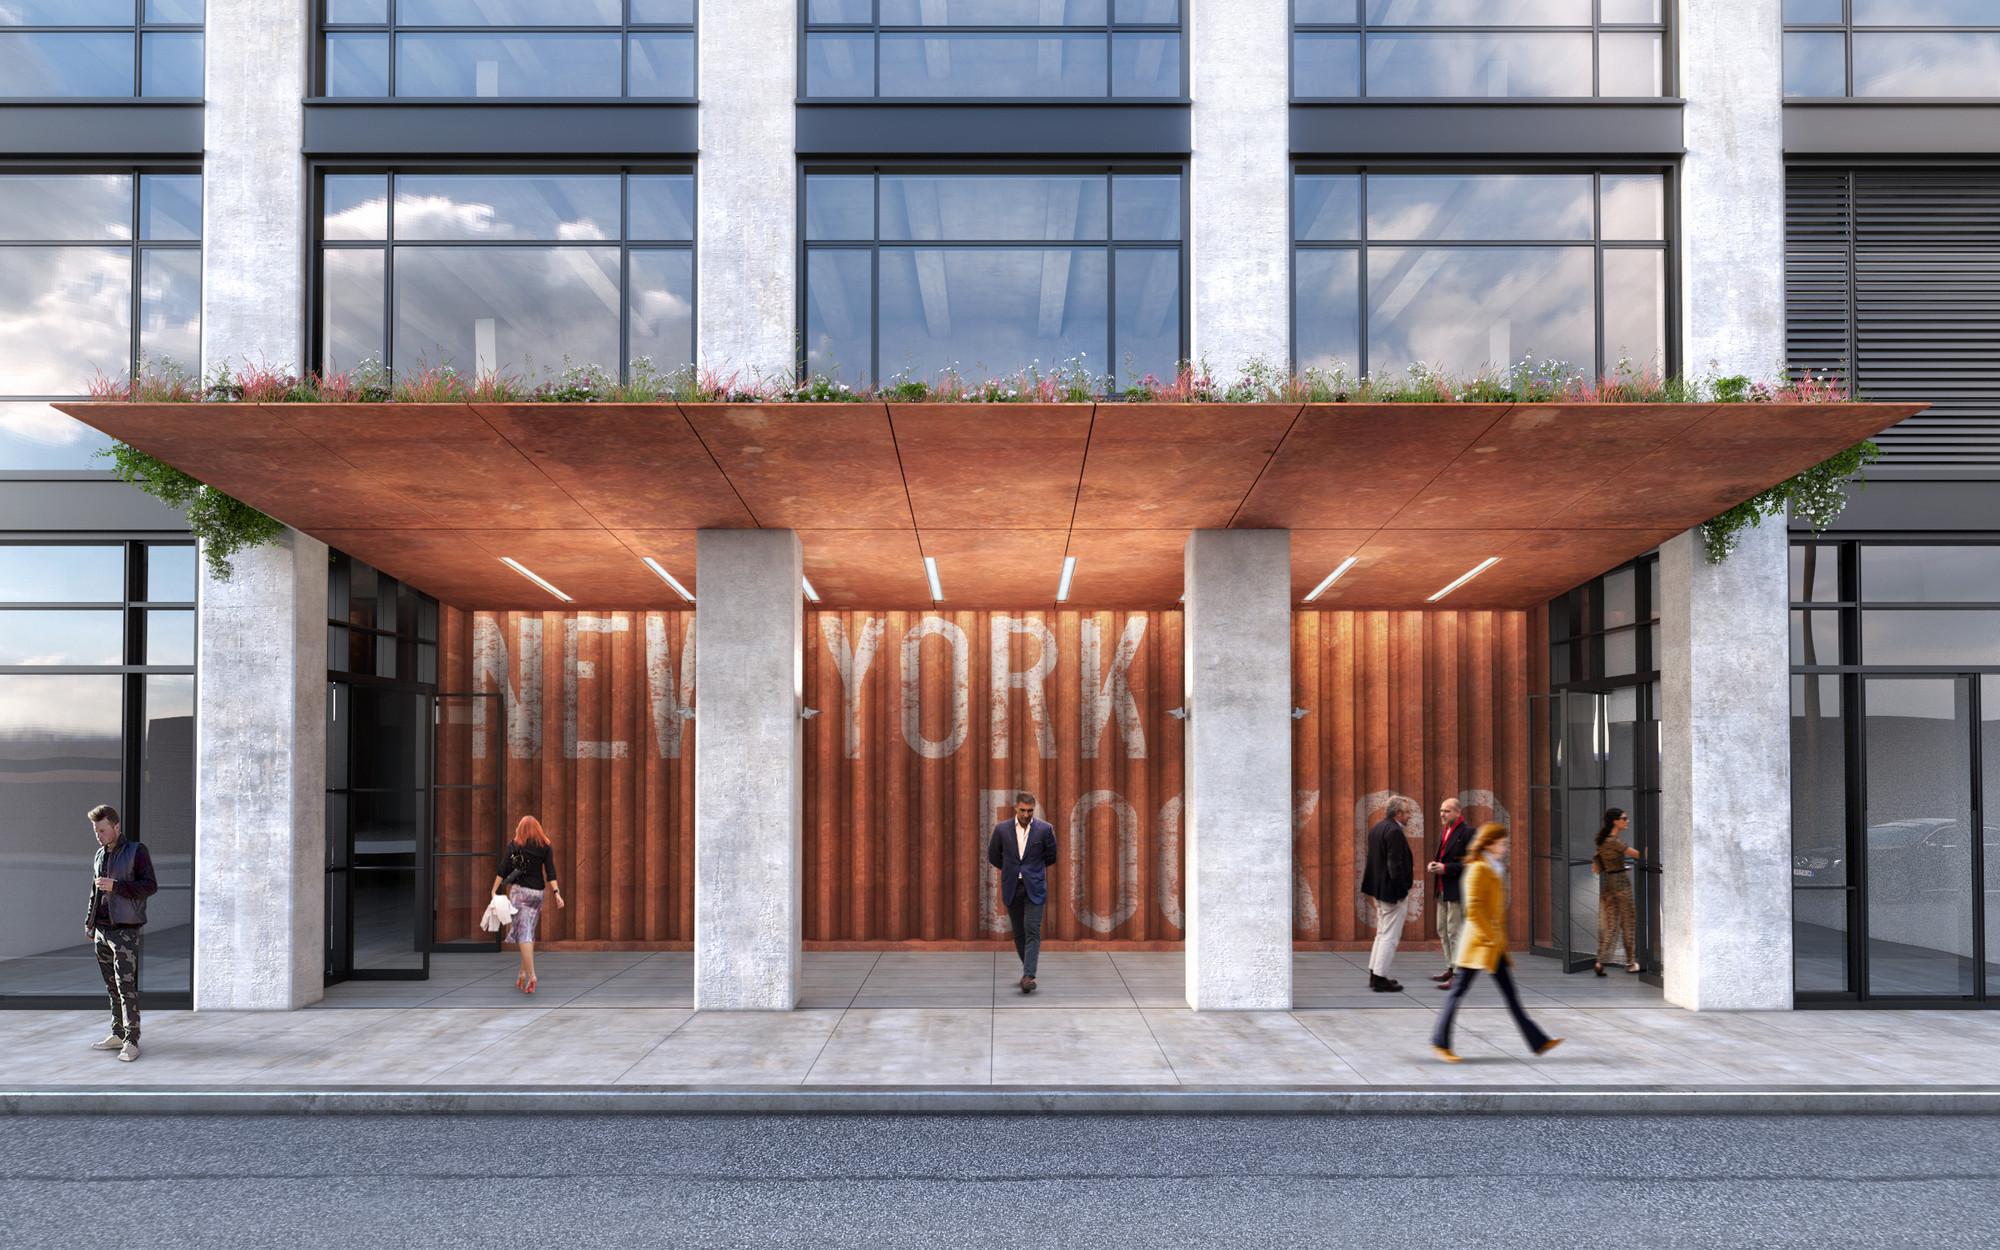 gallery of aa studio designs redevelopment of disused dock building 5. Black Bedroom Furniture Sets. Home Design Ideas